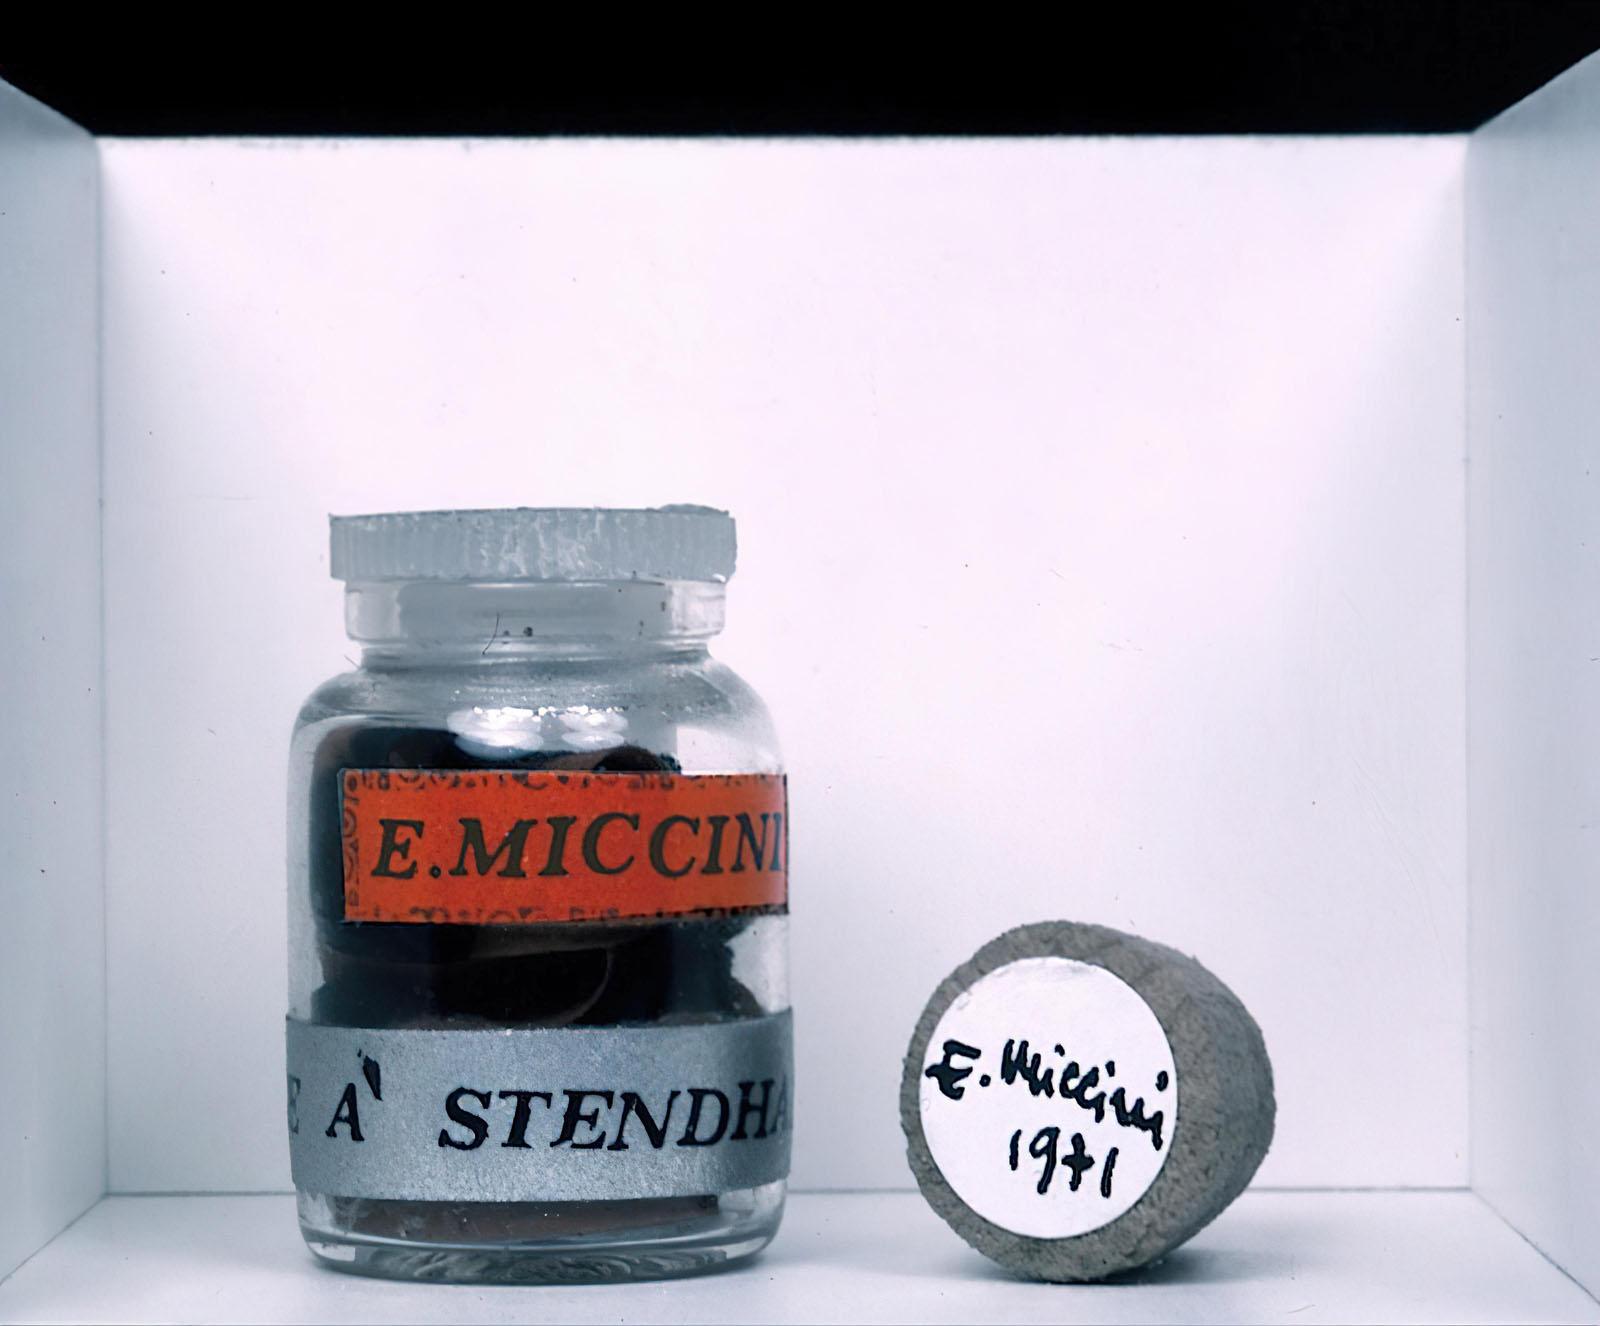 Eugenio Miccini - «Hommage à Stendhal»